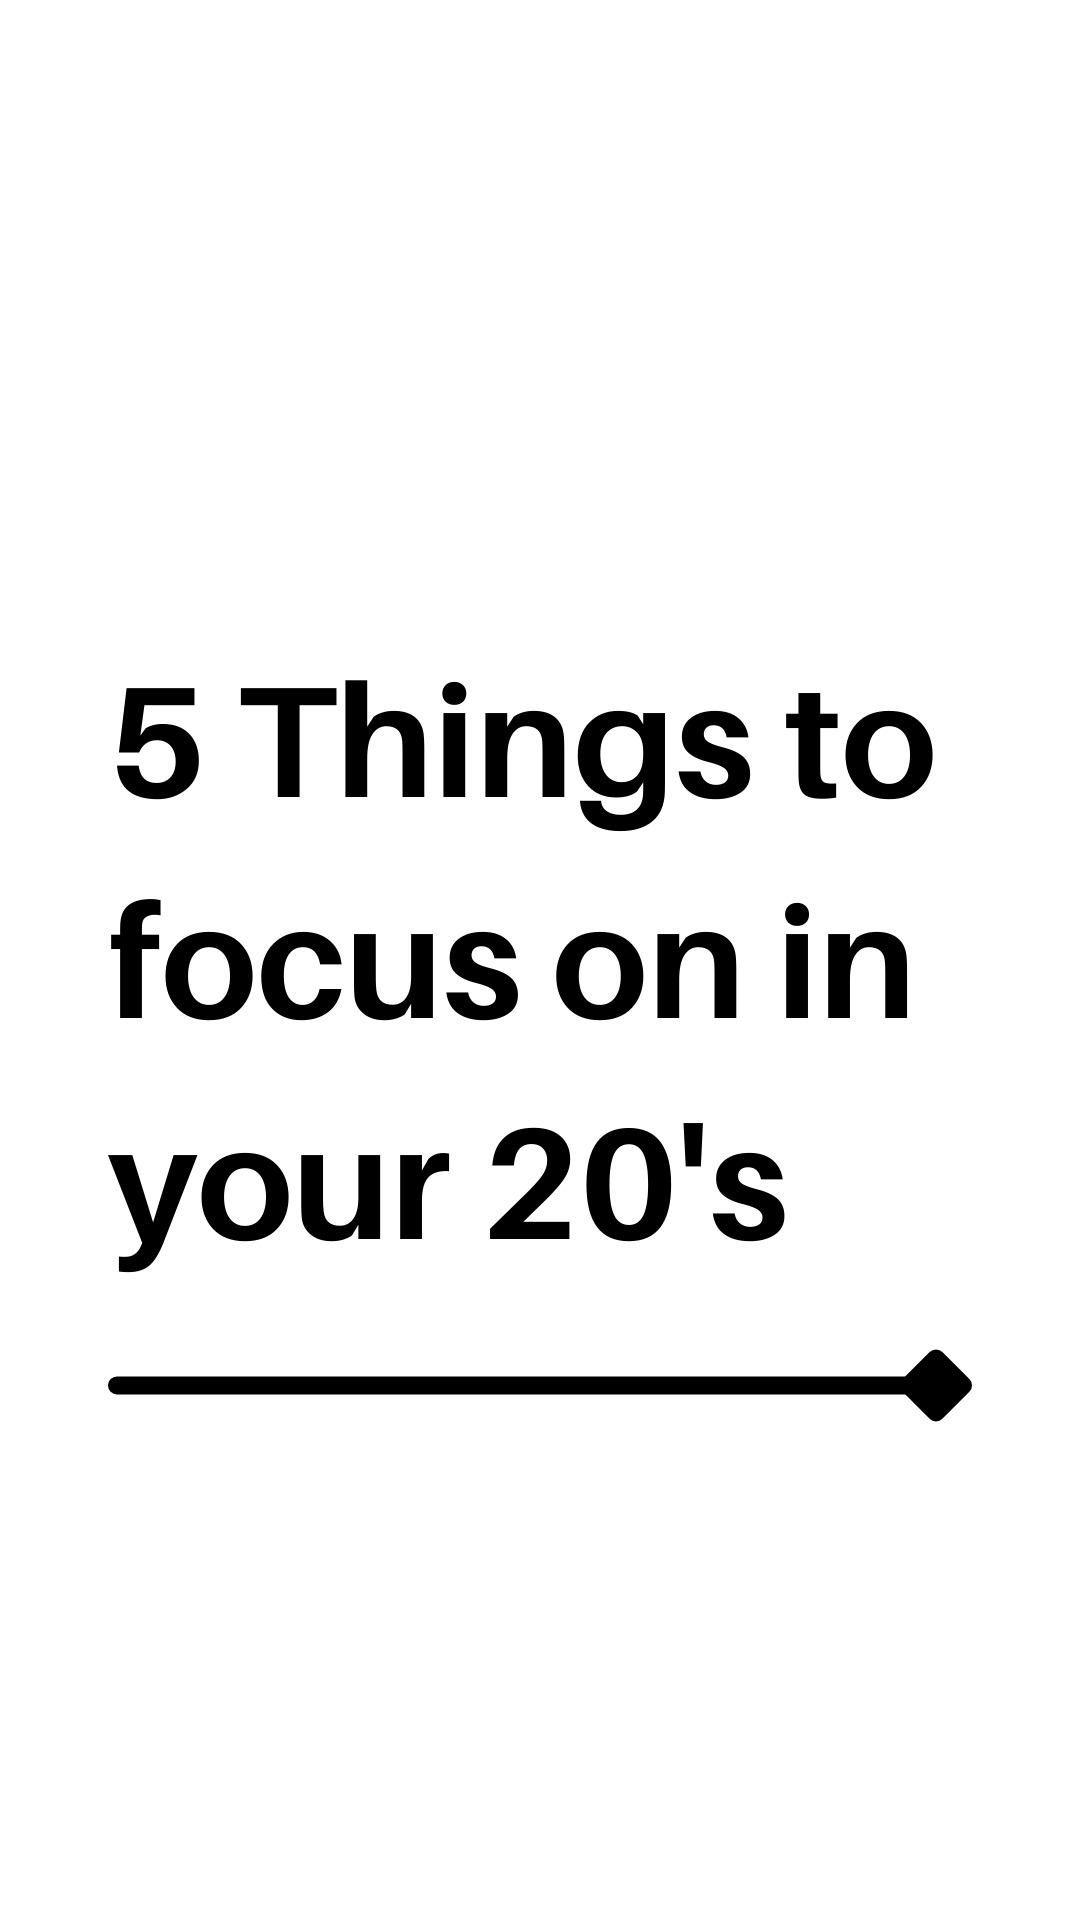 focus on 20's